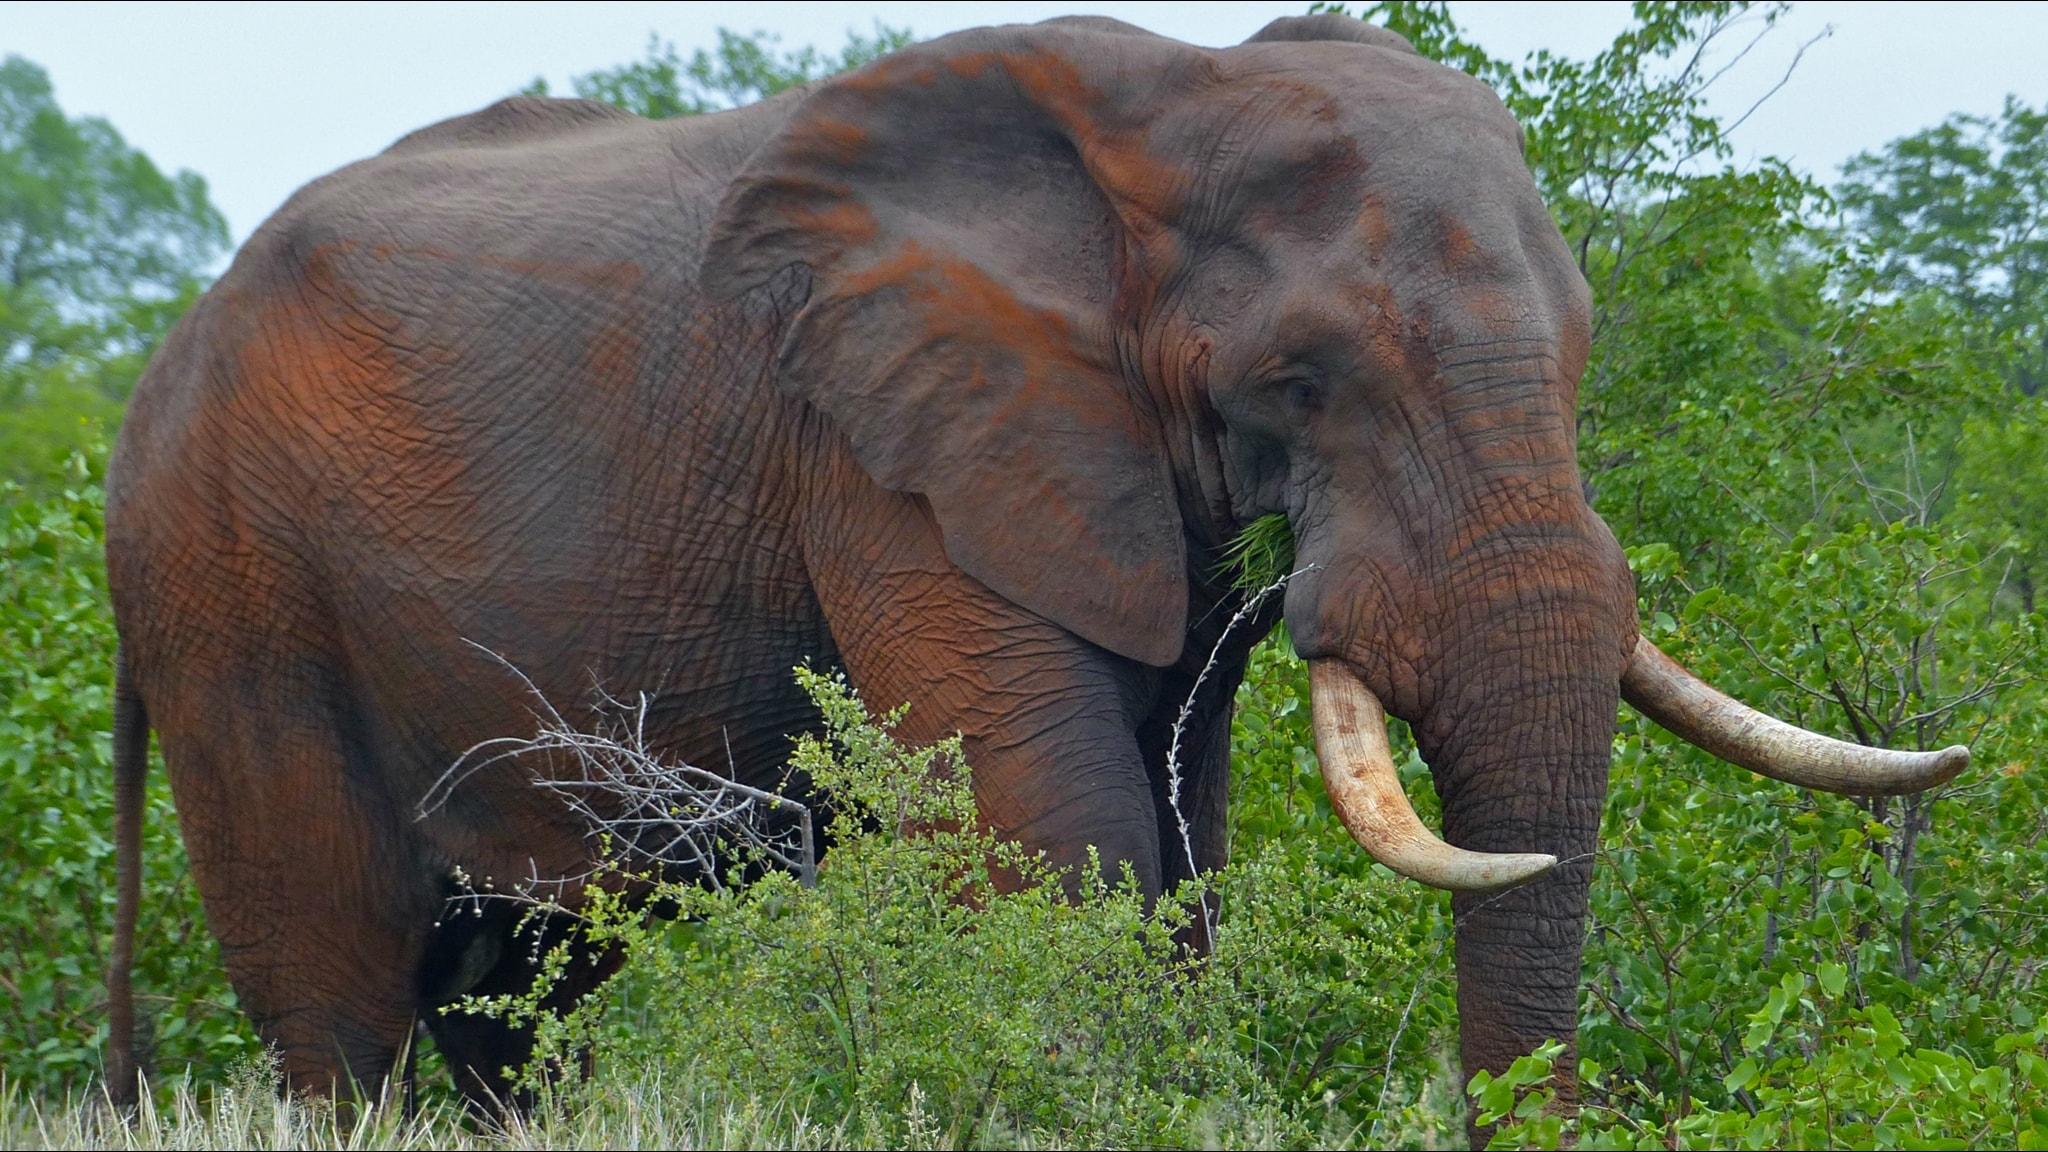 Afrikansk elefanttjur i nationalpark i Sydafrika.